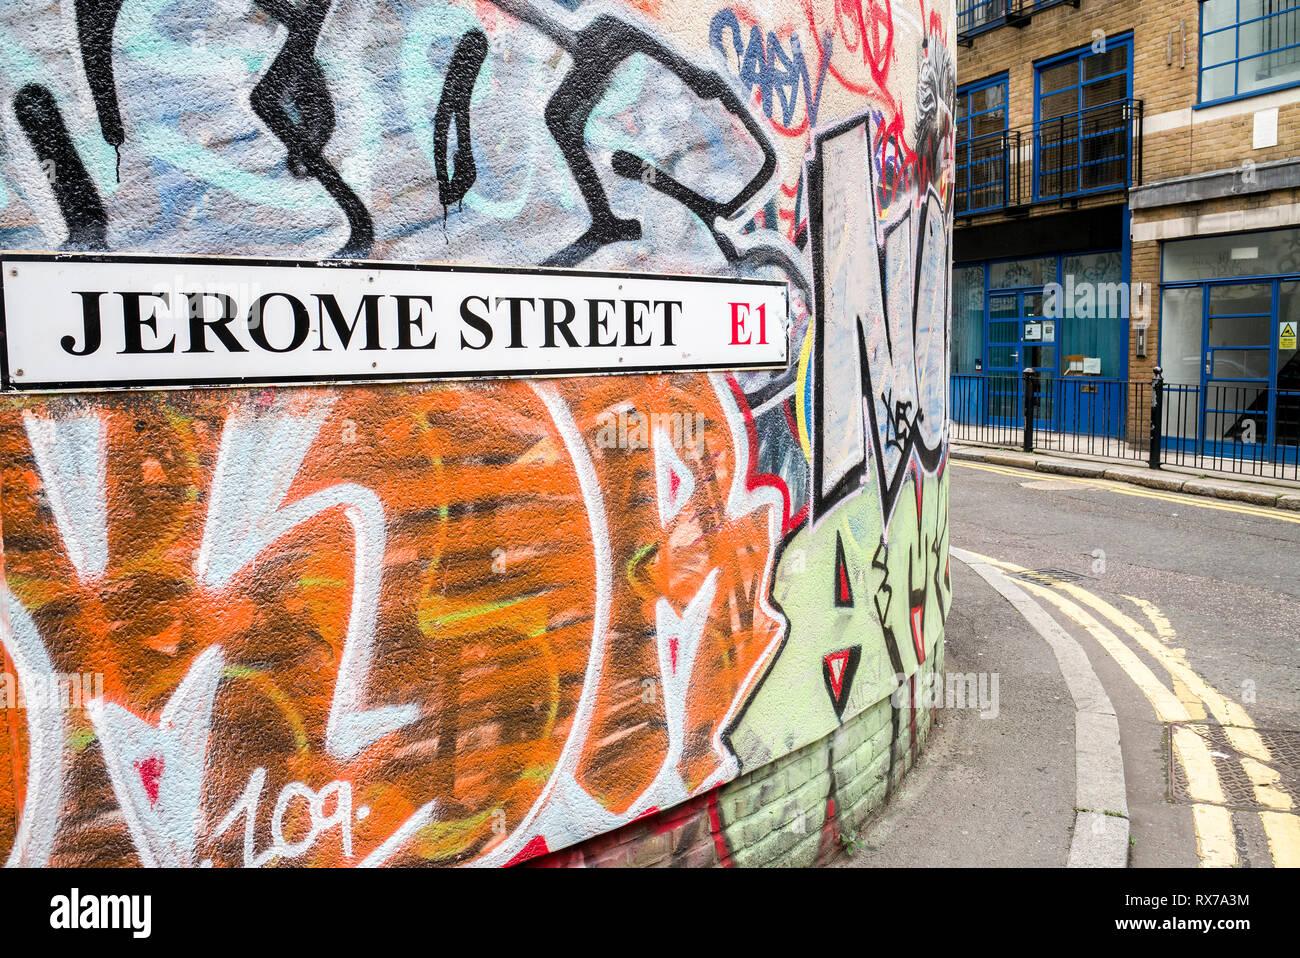 Jerome street E1 Spitalfields London Stock Photo